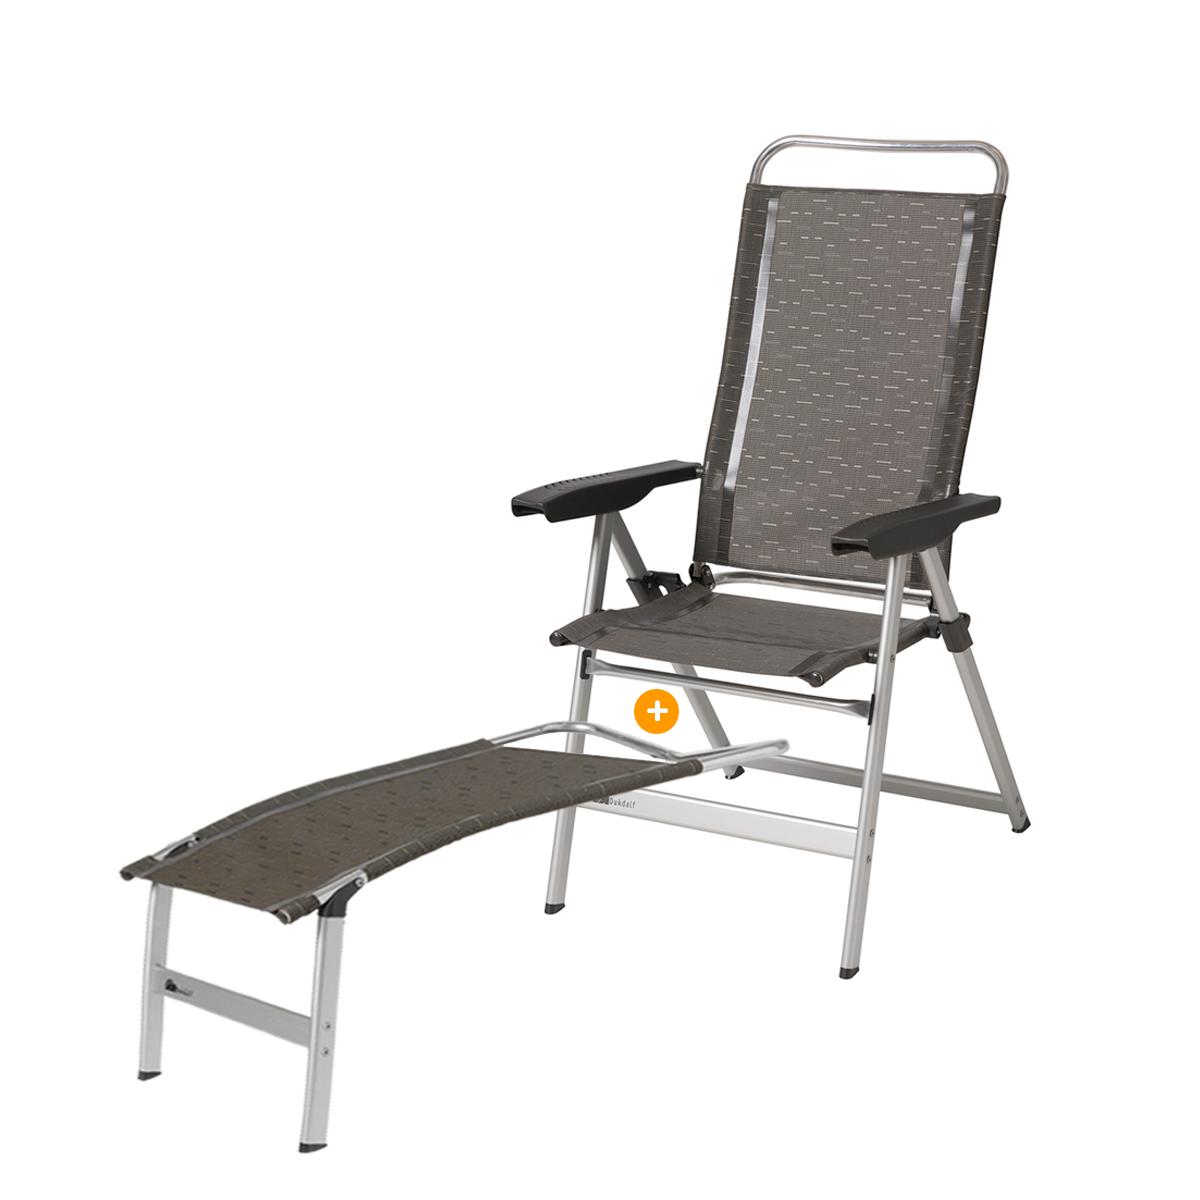 Dukdalf Dynamic Campingstoel + Voetenbank